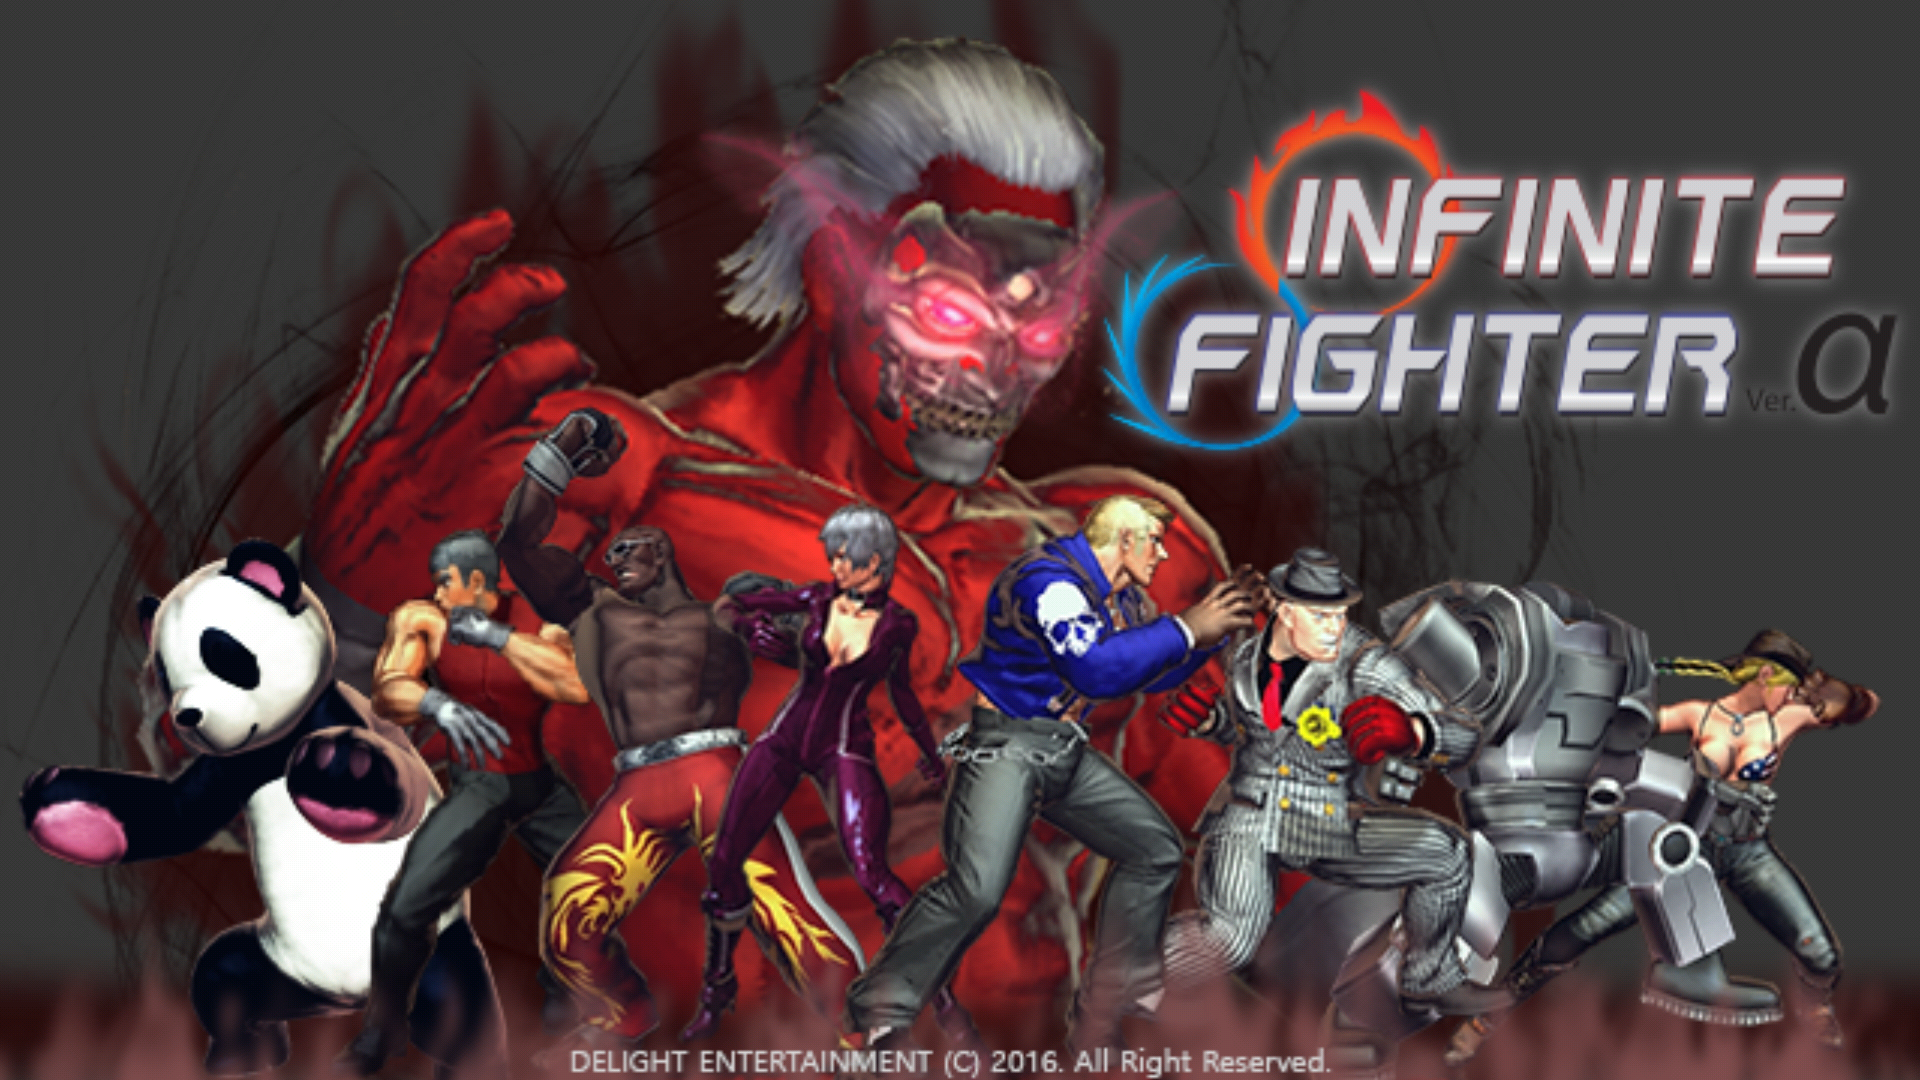 infinite-fighter-apk-download-droidapk-org-2